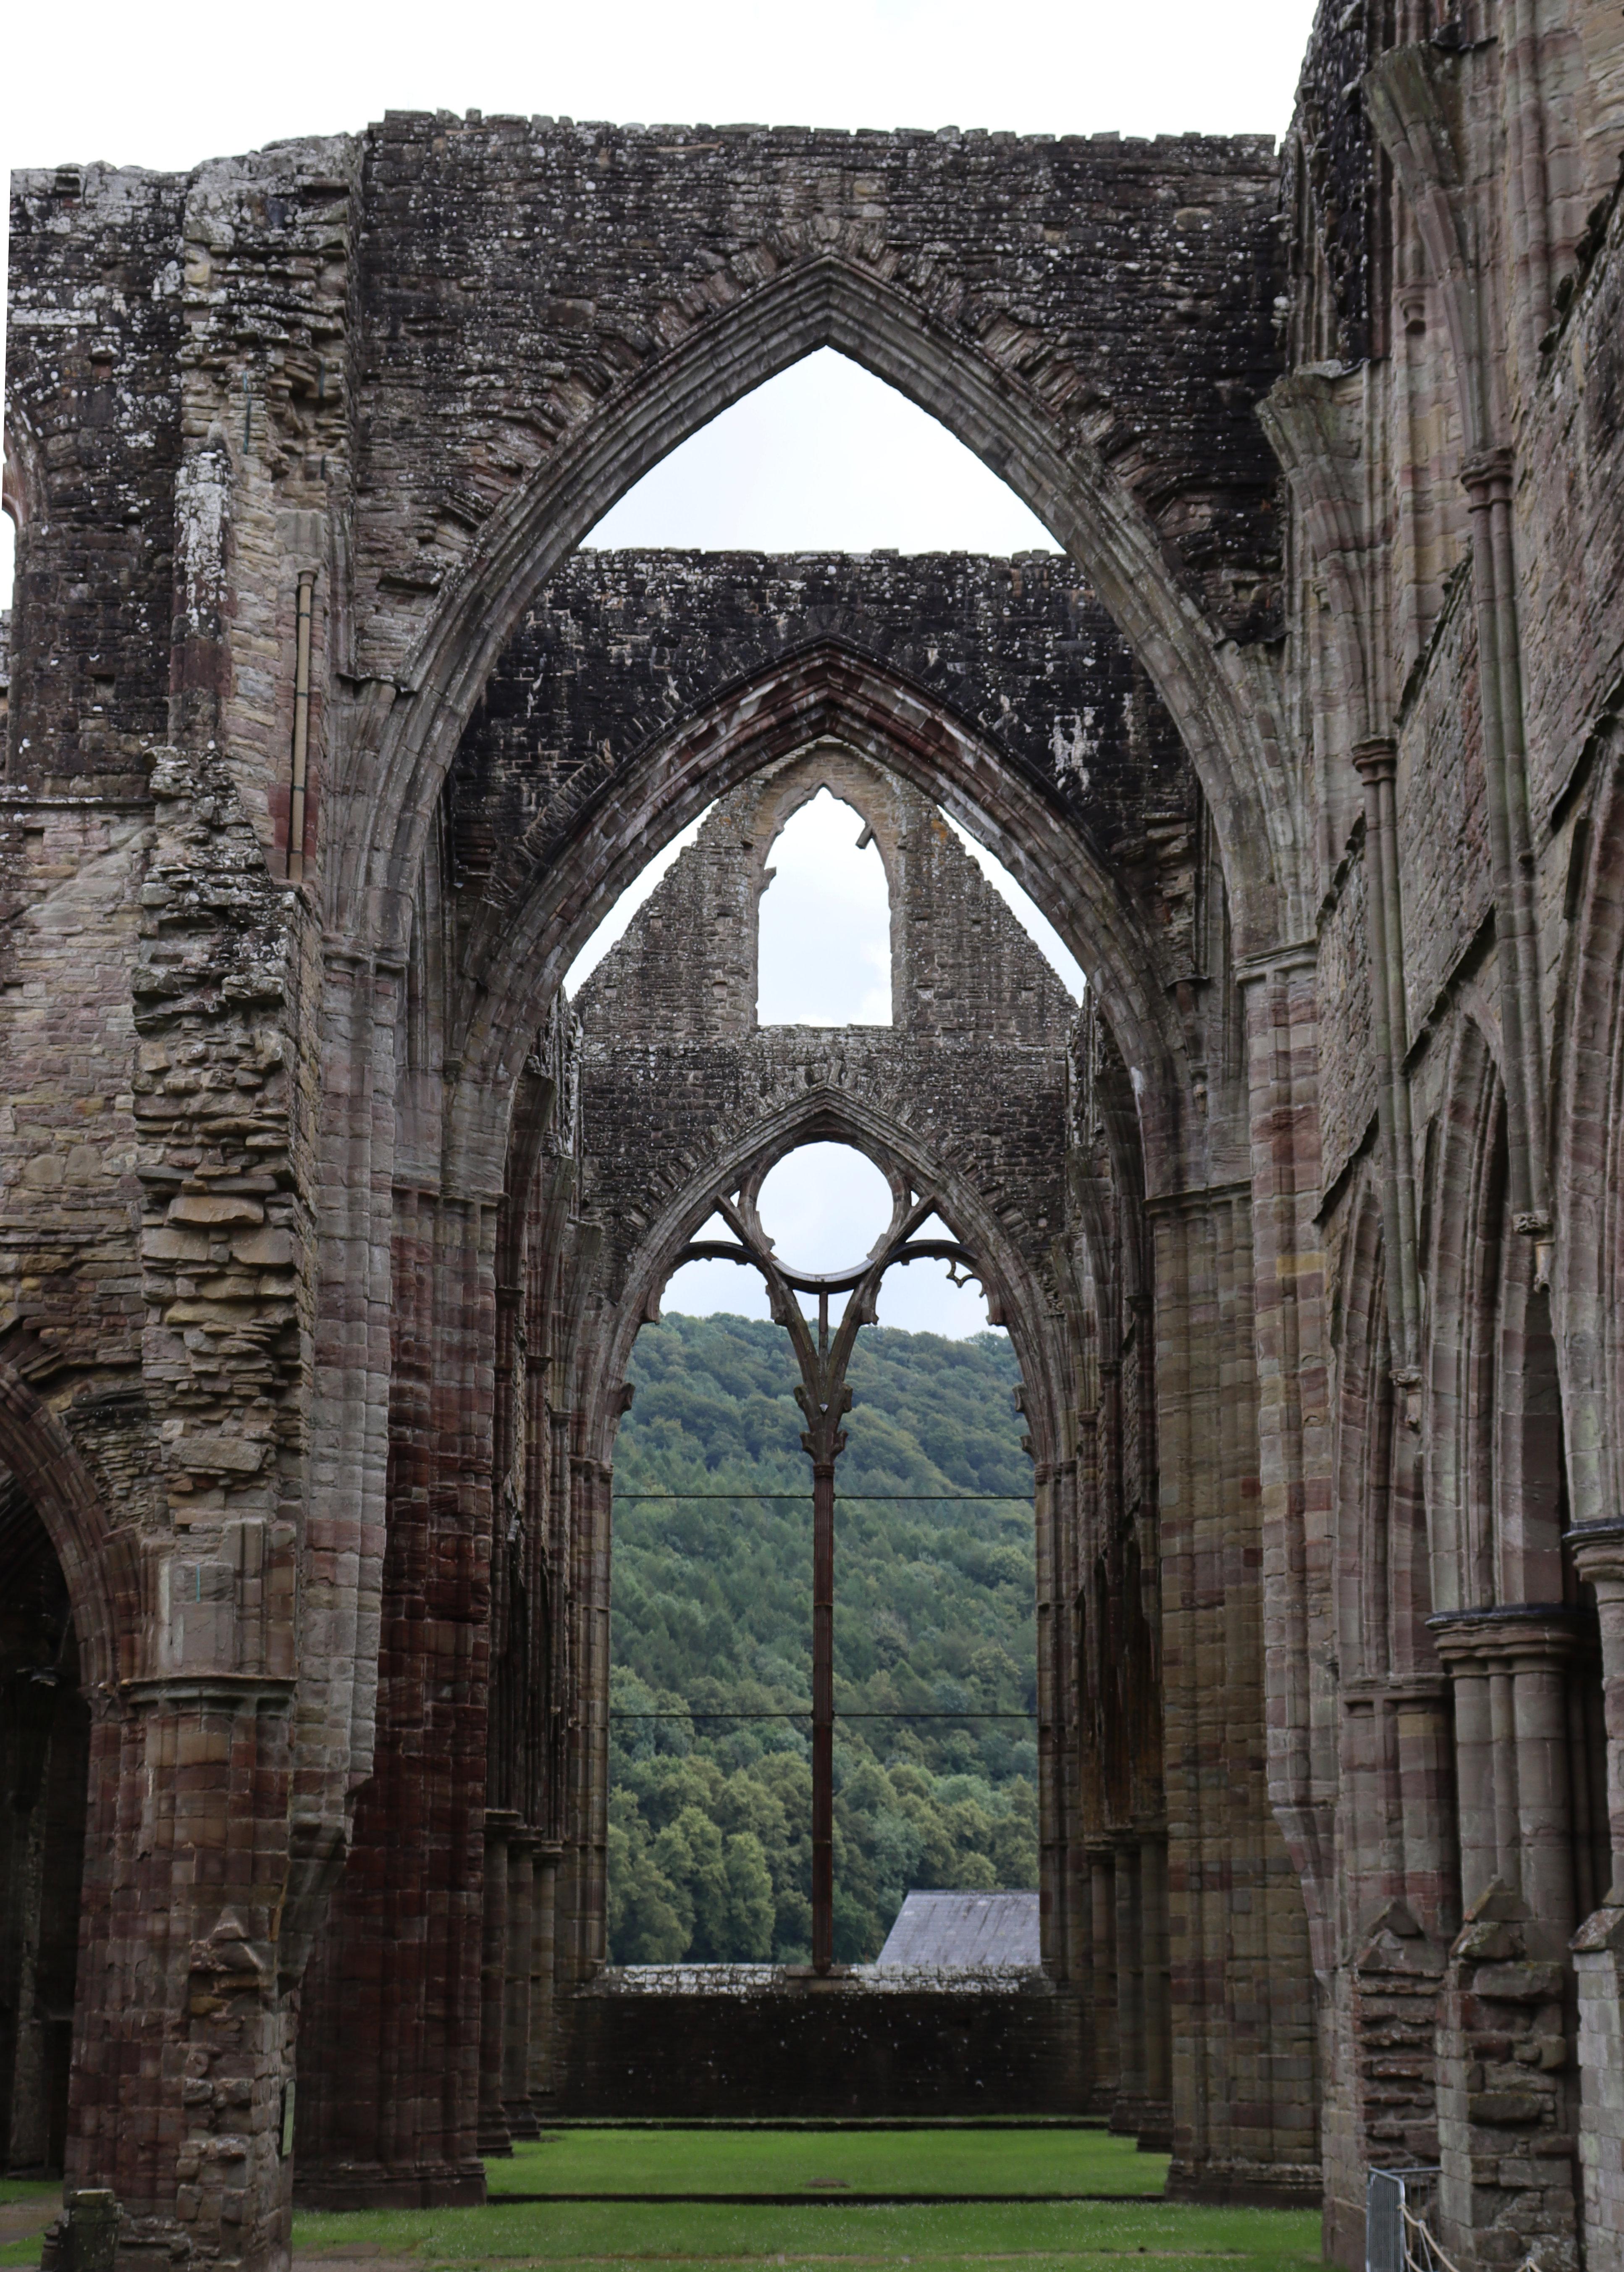 Archways aligning with windows inside Tintern Abbey.